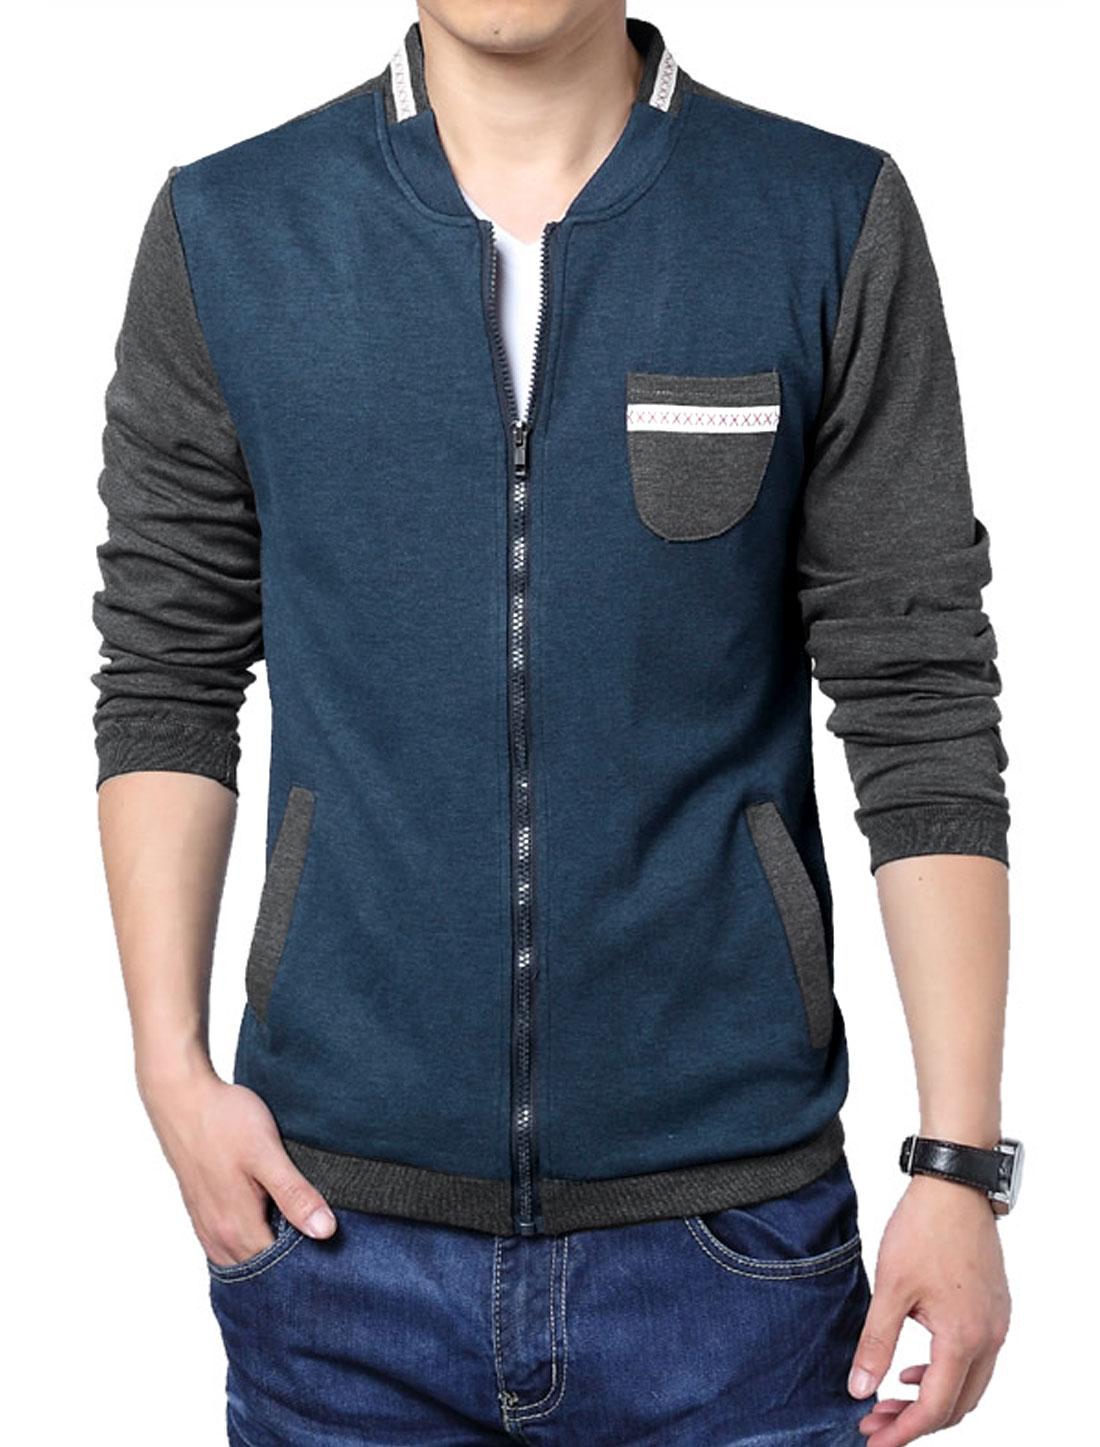 Men Long Sleeve Zip Up Panel Design Colorblock Basic Jacket Navy Blue L